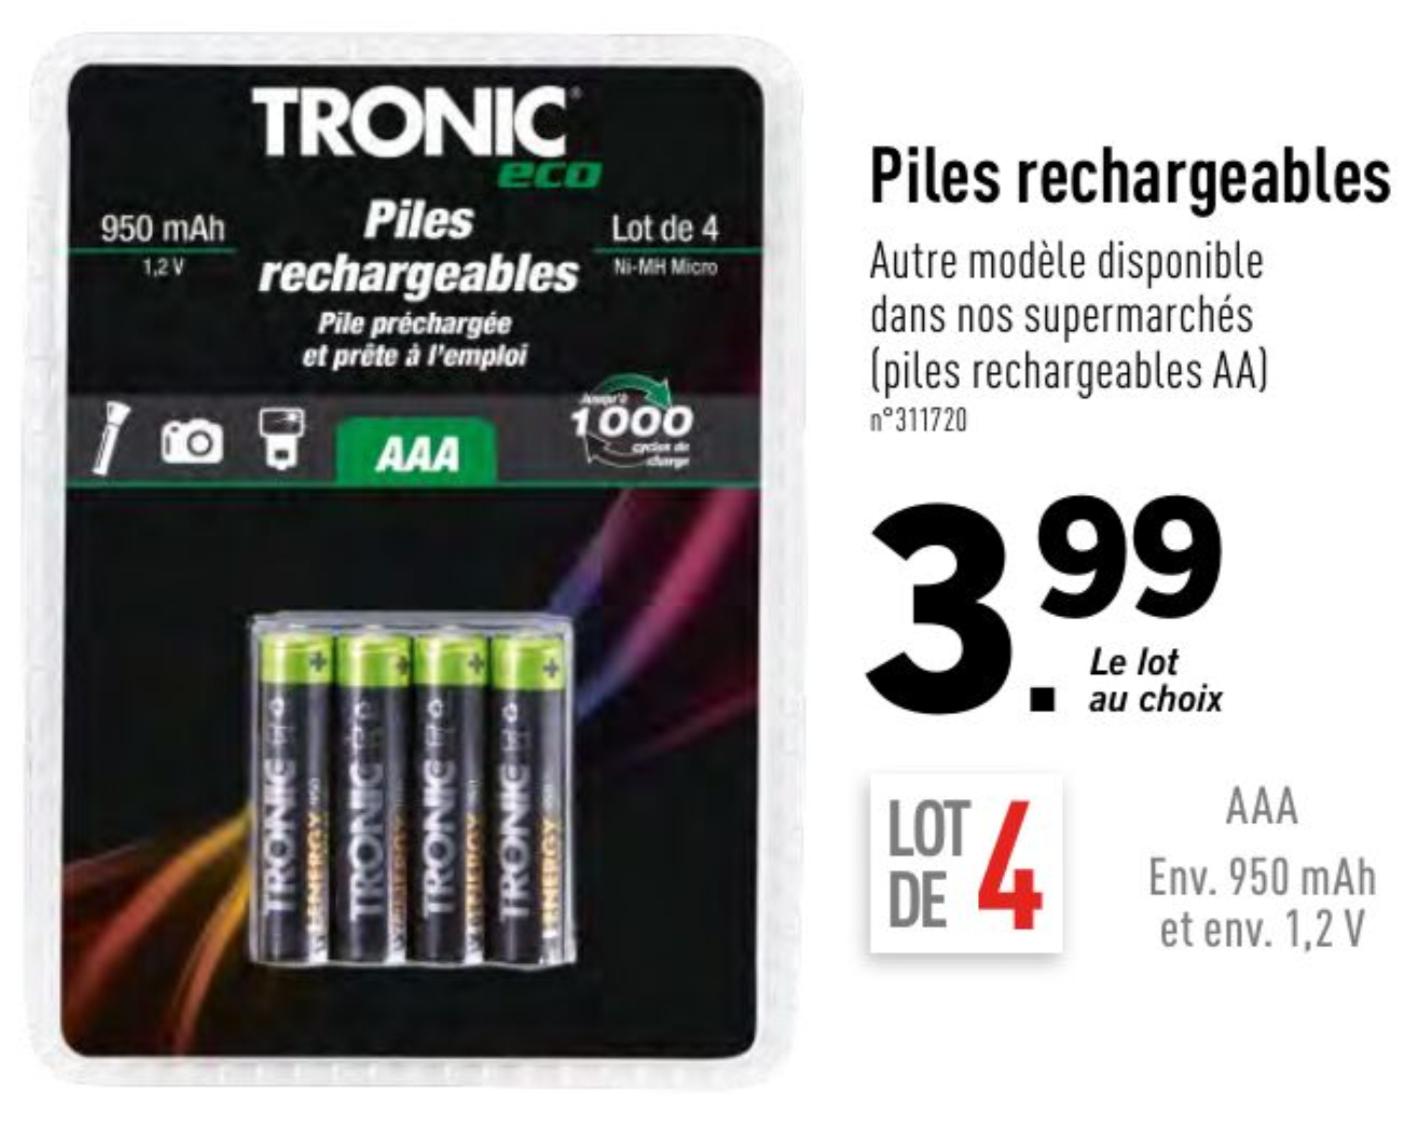 Lot de 4 piles rechargeables Tronic (4 piles AAA ou 4 piles AA rechargeables)